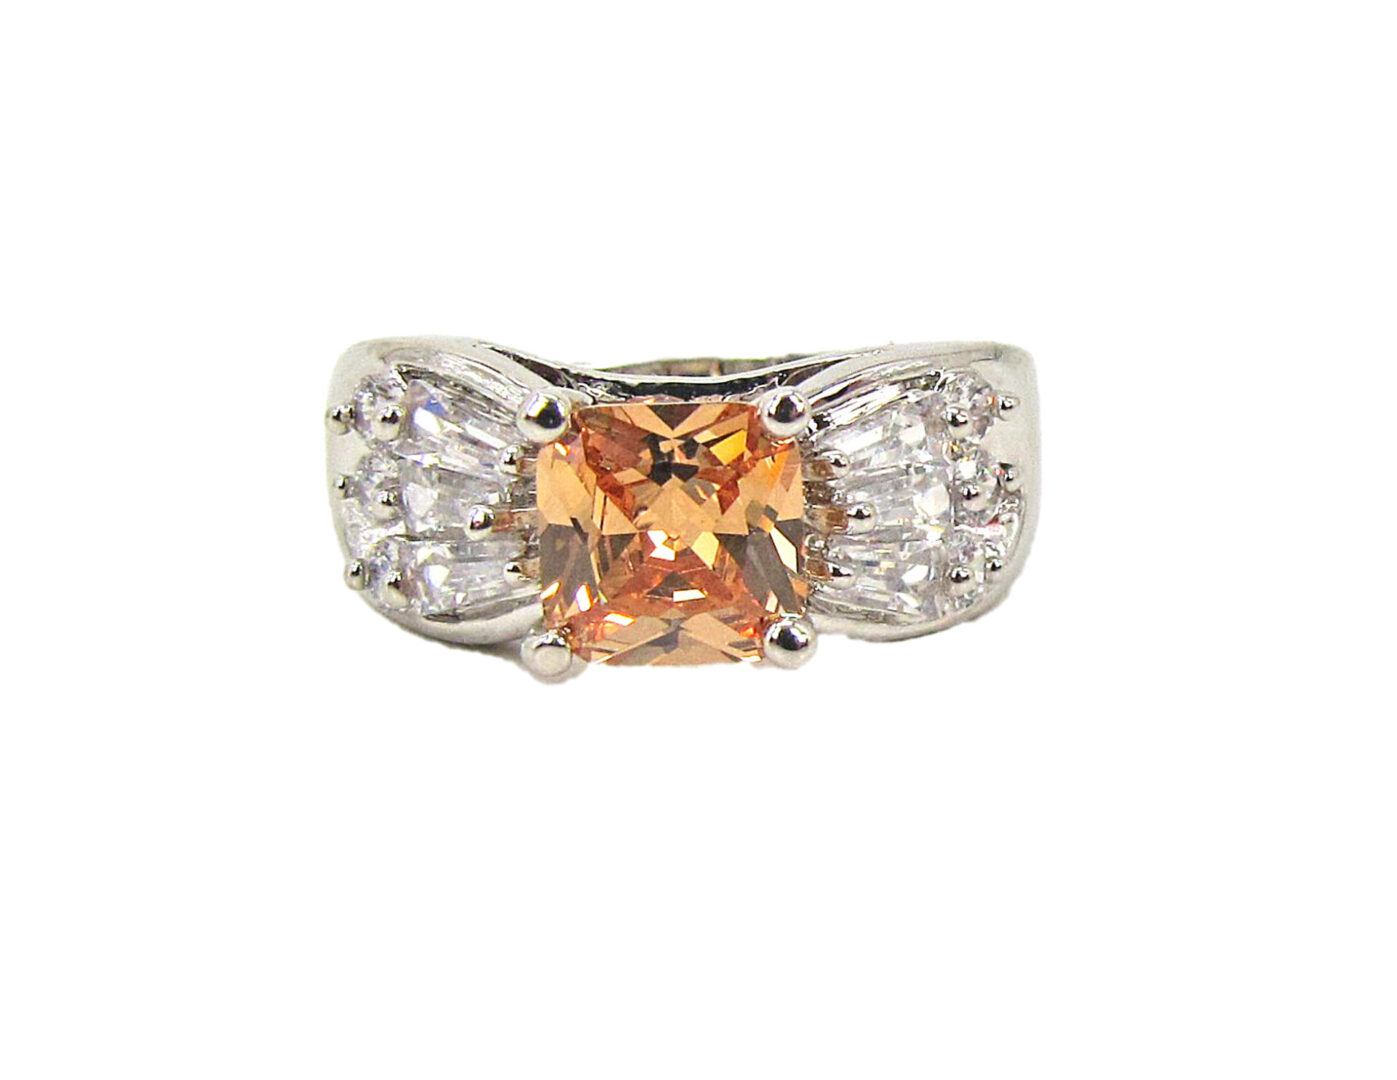 Cubic Zirconia stone ring